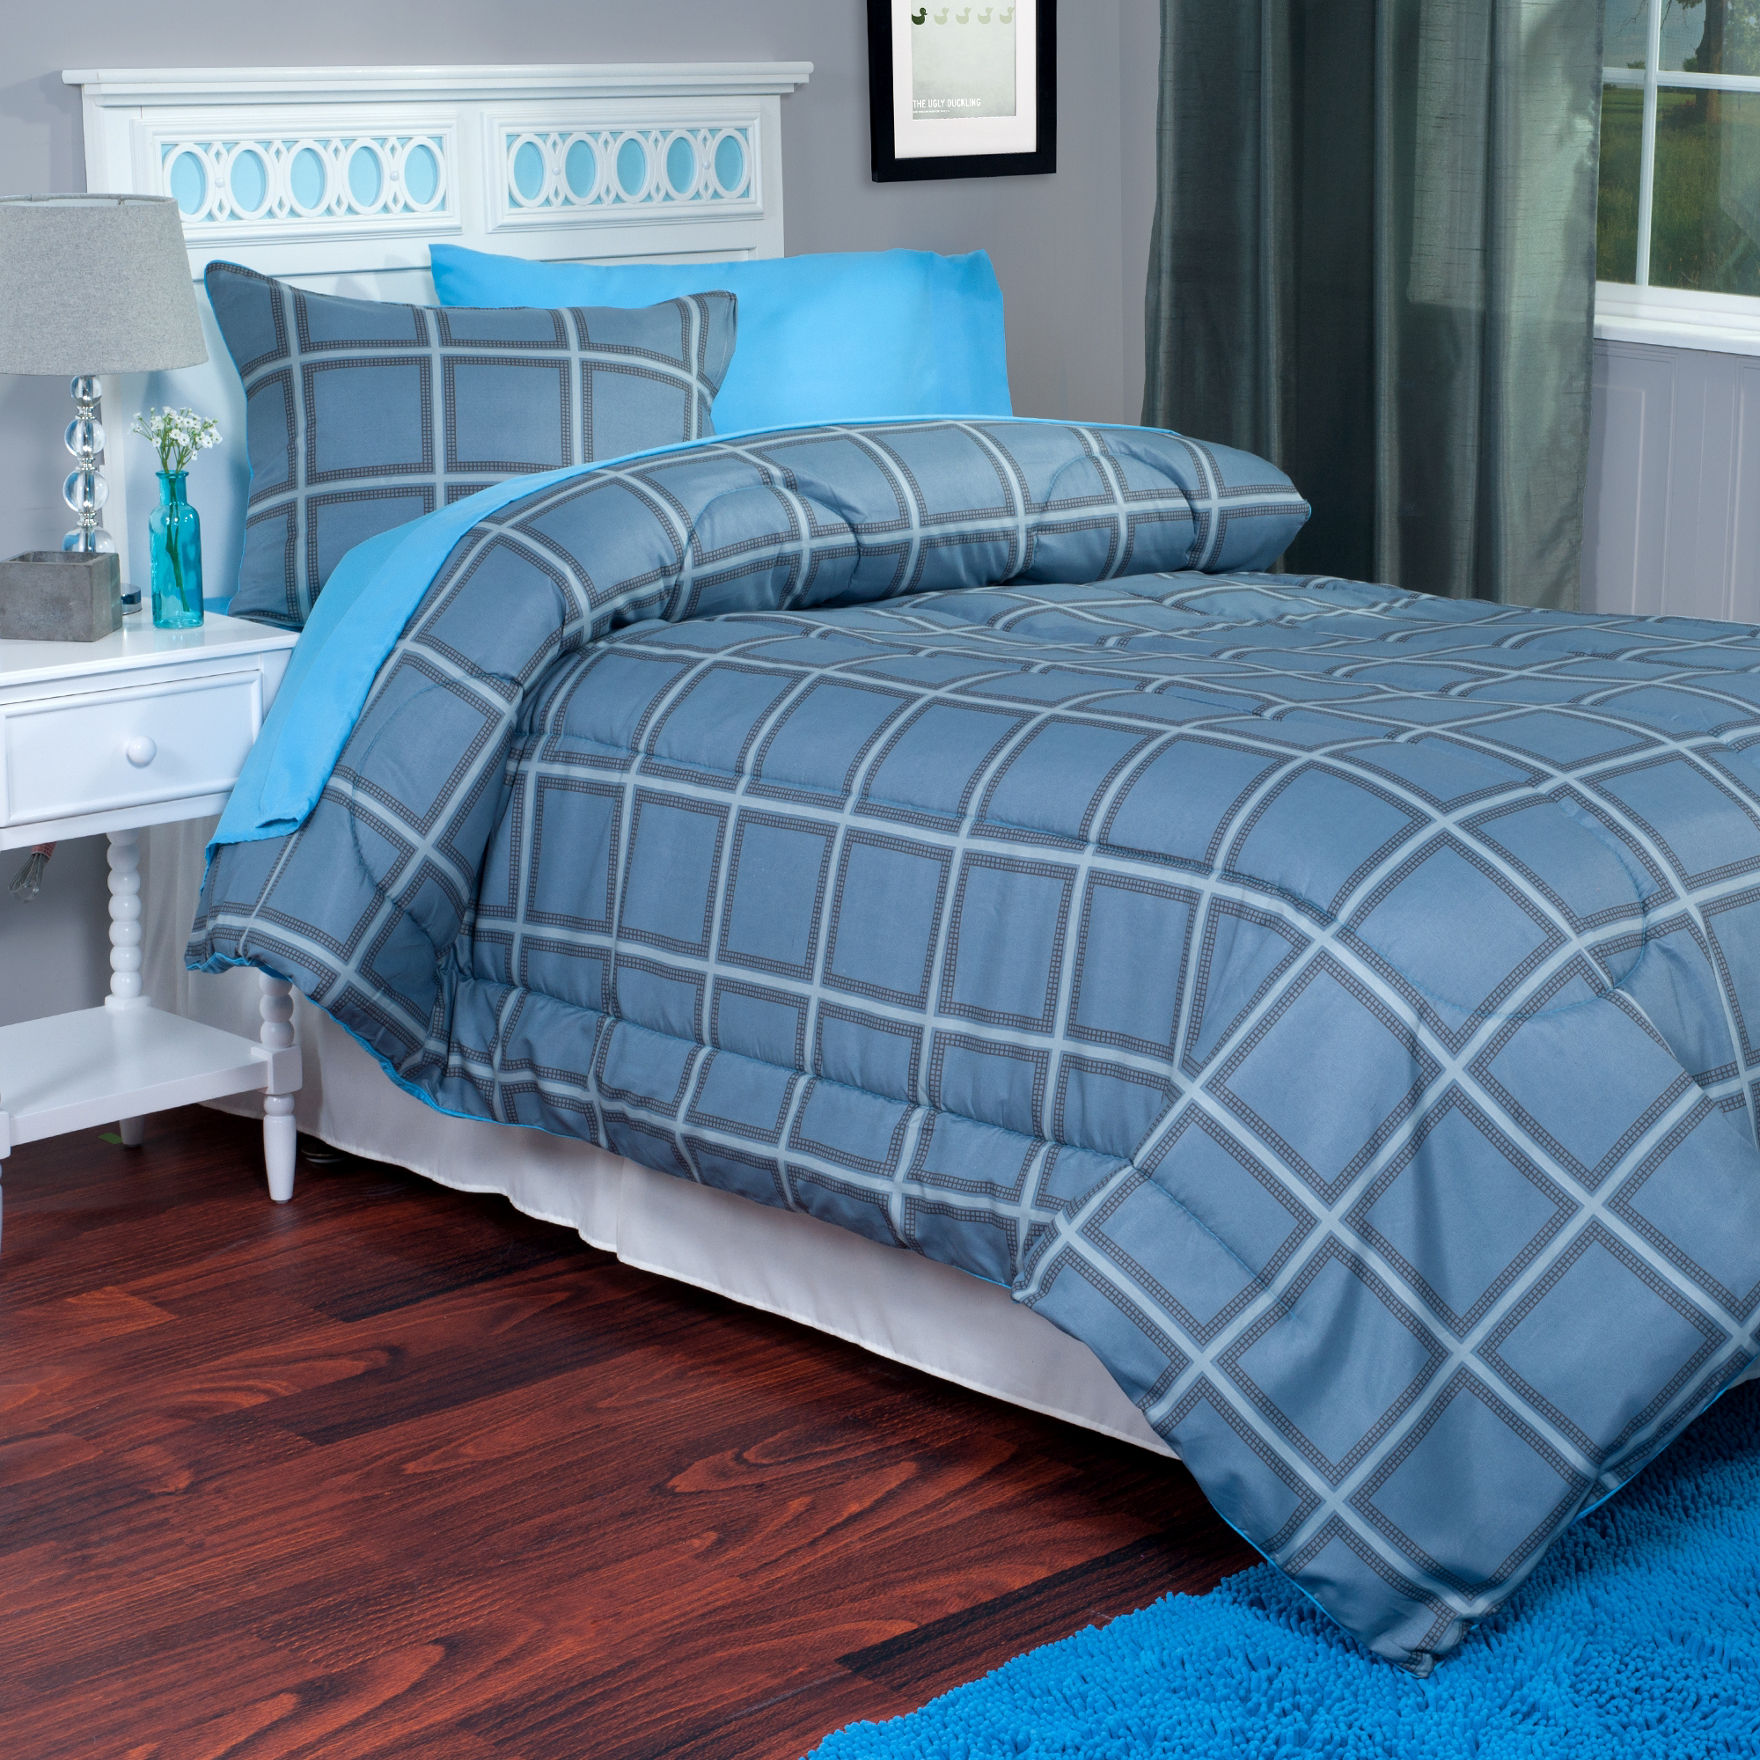 Lavish Home Blue / Grey Comforters & Comforter Sets